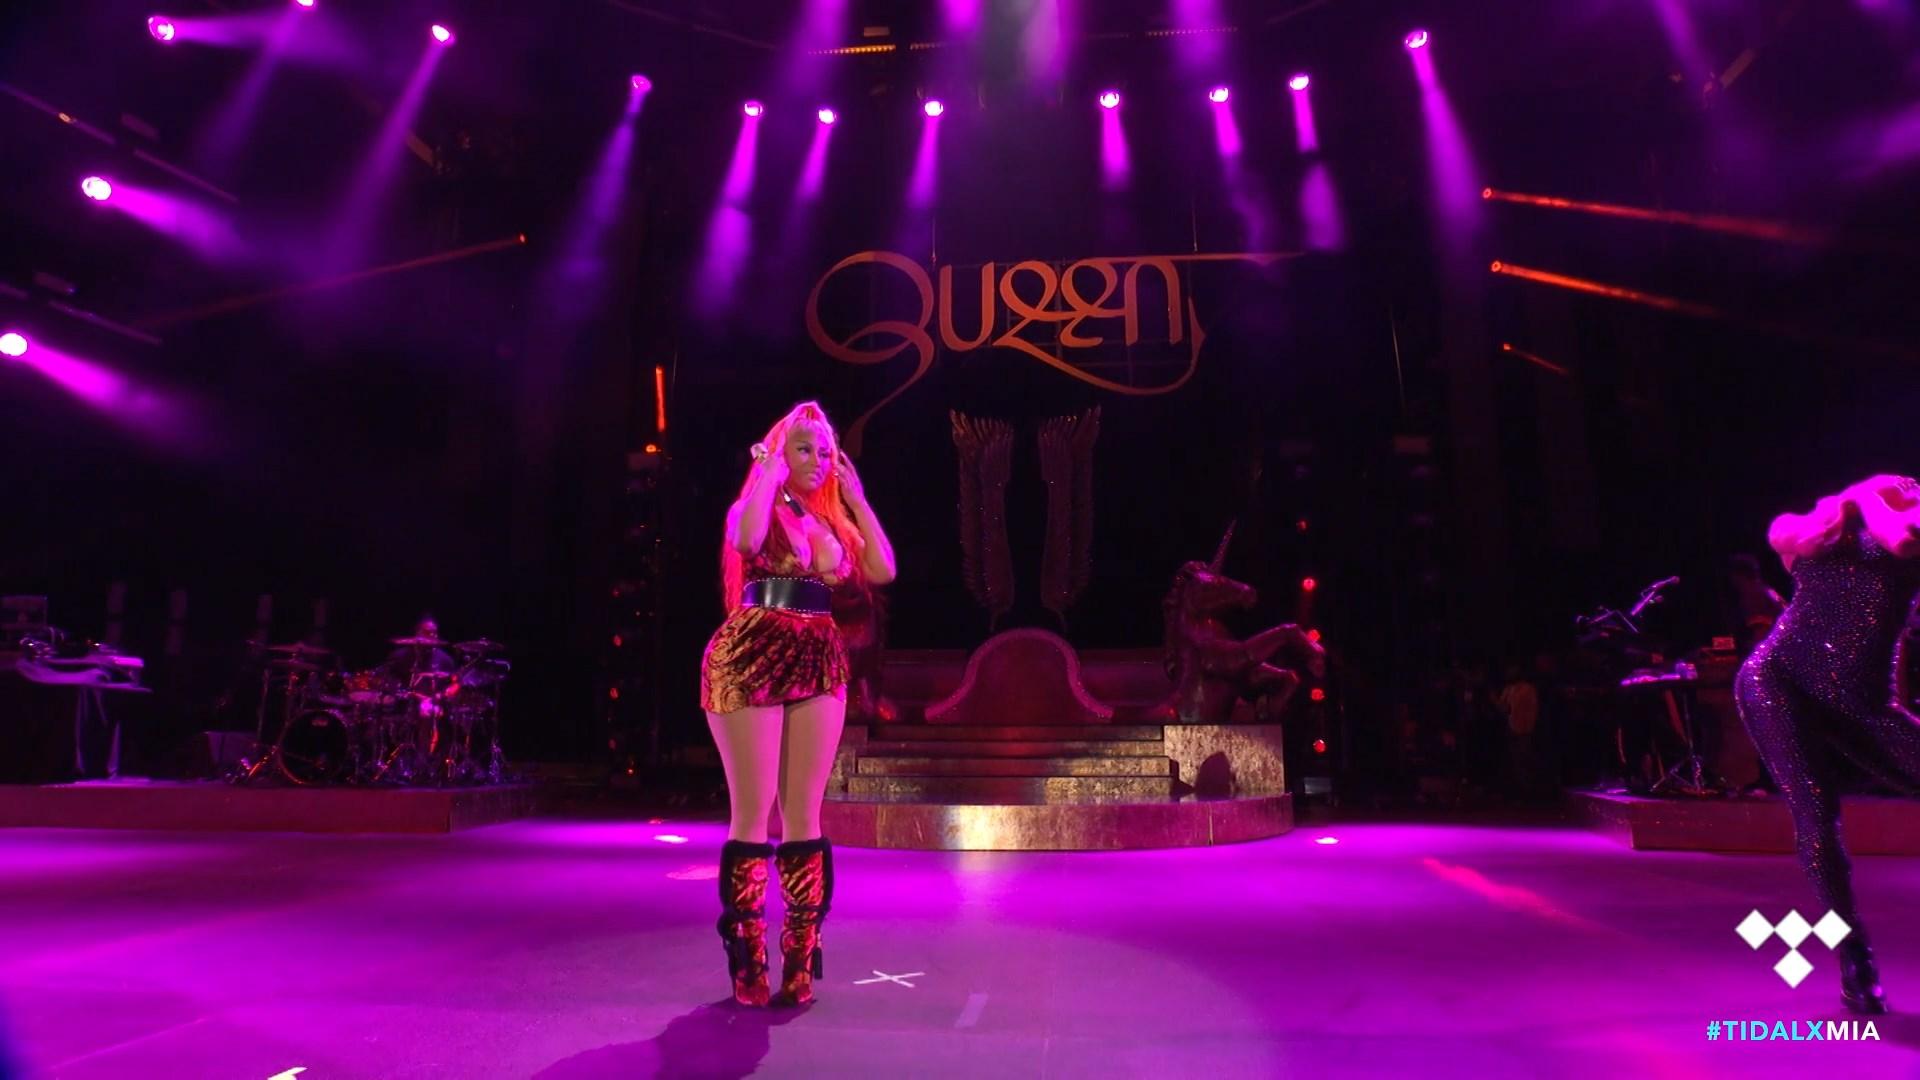 Nicki-Minaj-Nude-TheFappeningBlog.com-16.jpg